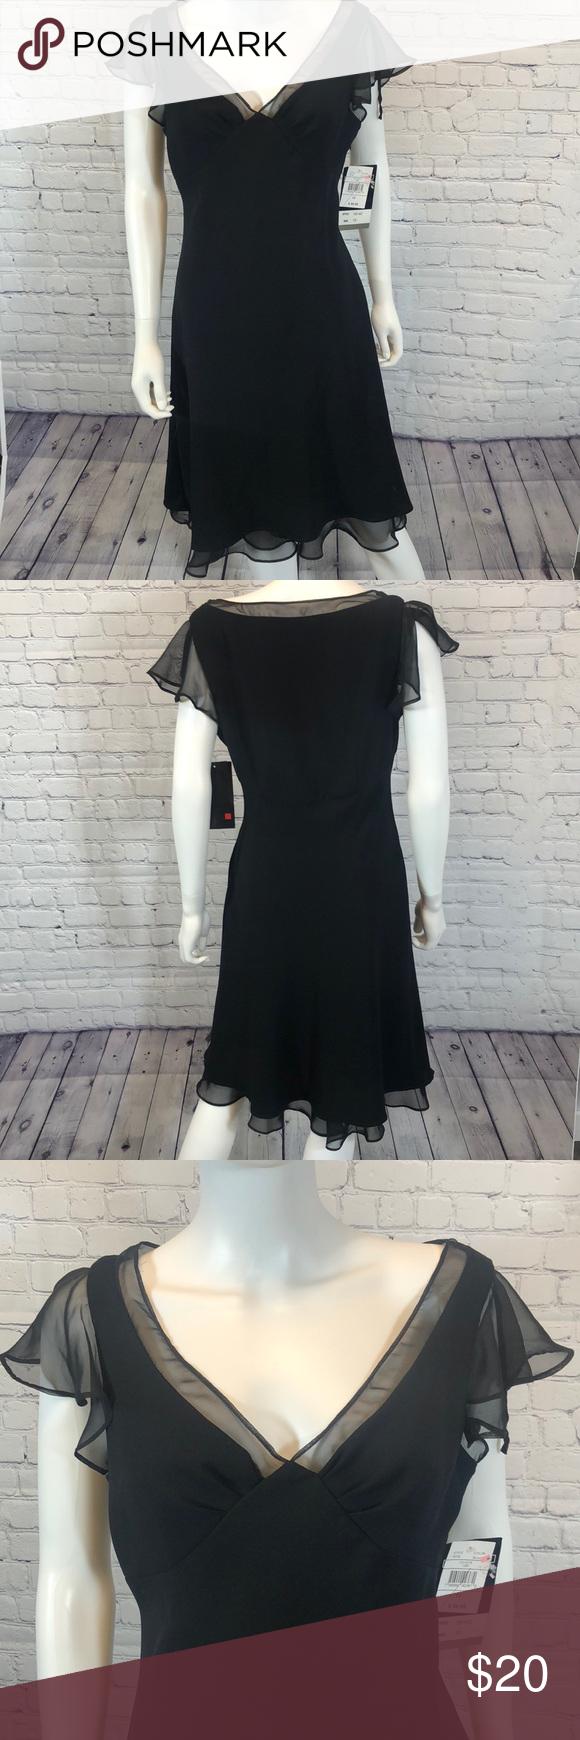 Black Dress Size 12 Nwt Clothes Design Dresses Black Dress [ 1740 x 580 Pixel ]